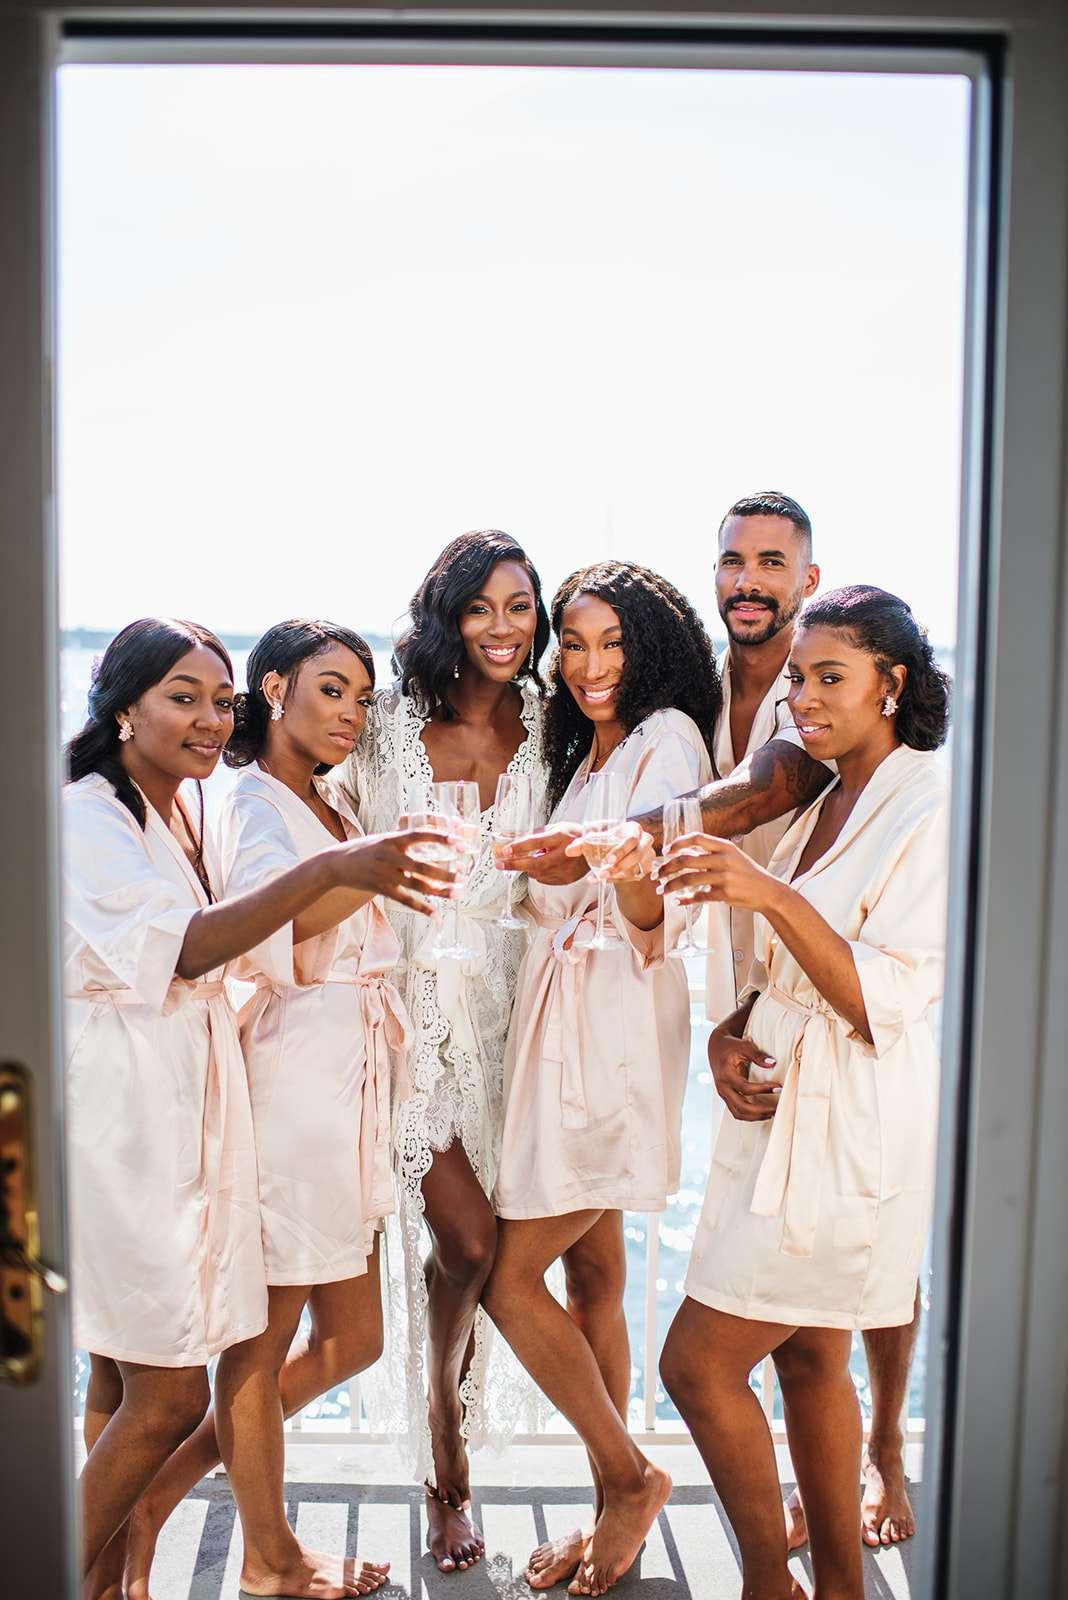 Bride, bridesmaids and bridesman on the balcony